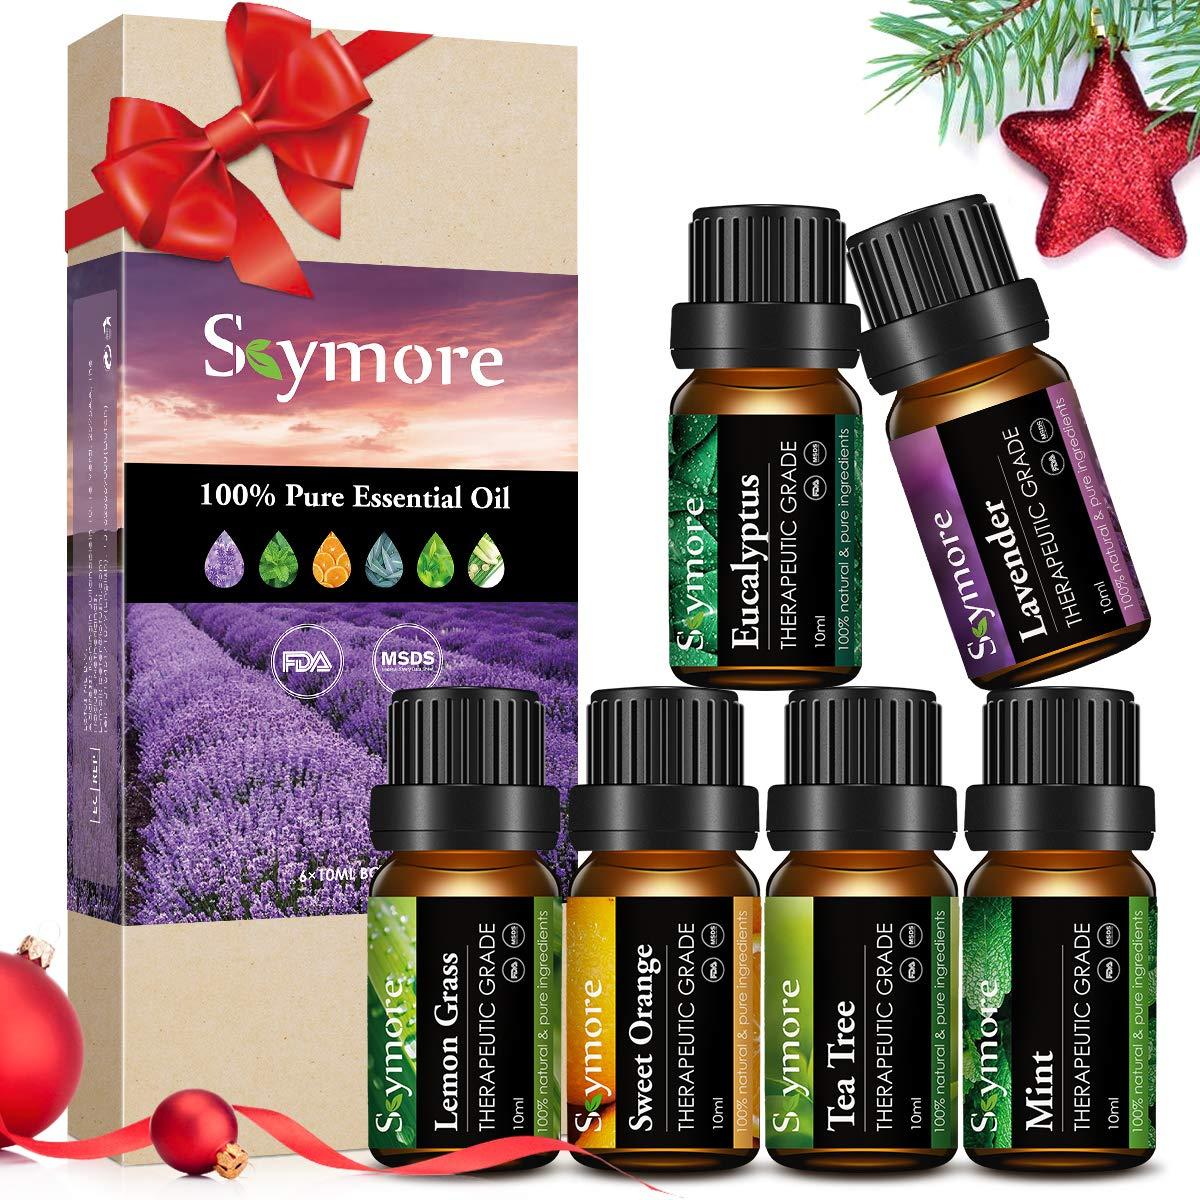 Ätherische Öle Geschenk Set, Skymore Neue Generation Aromatherapie Duftöl